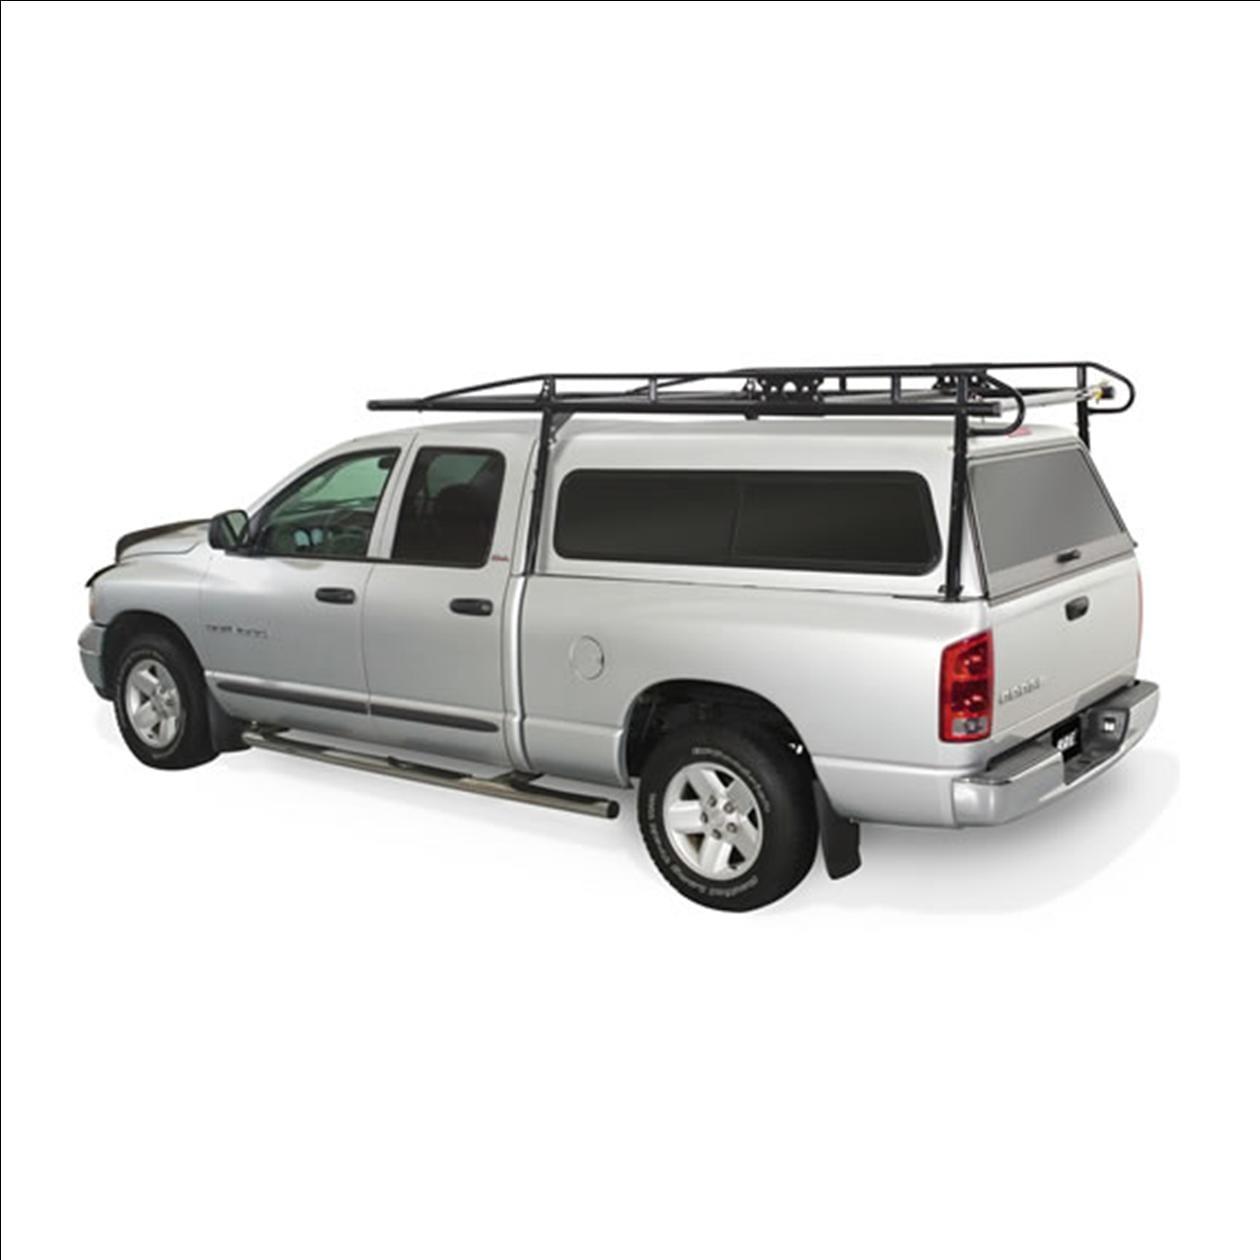 heavy duty pro ii pickup truck topper ladder rack for full size trucks